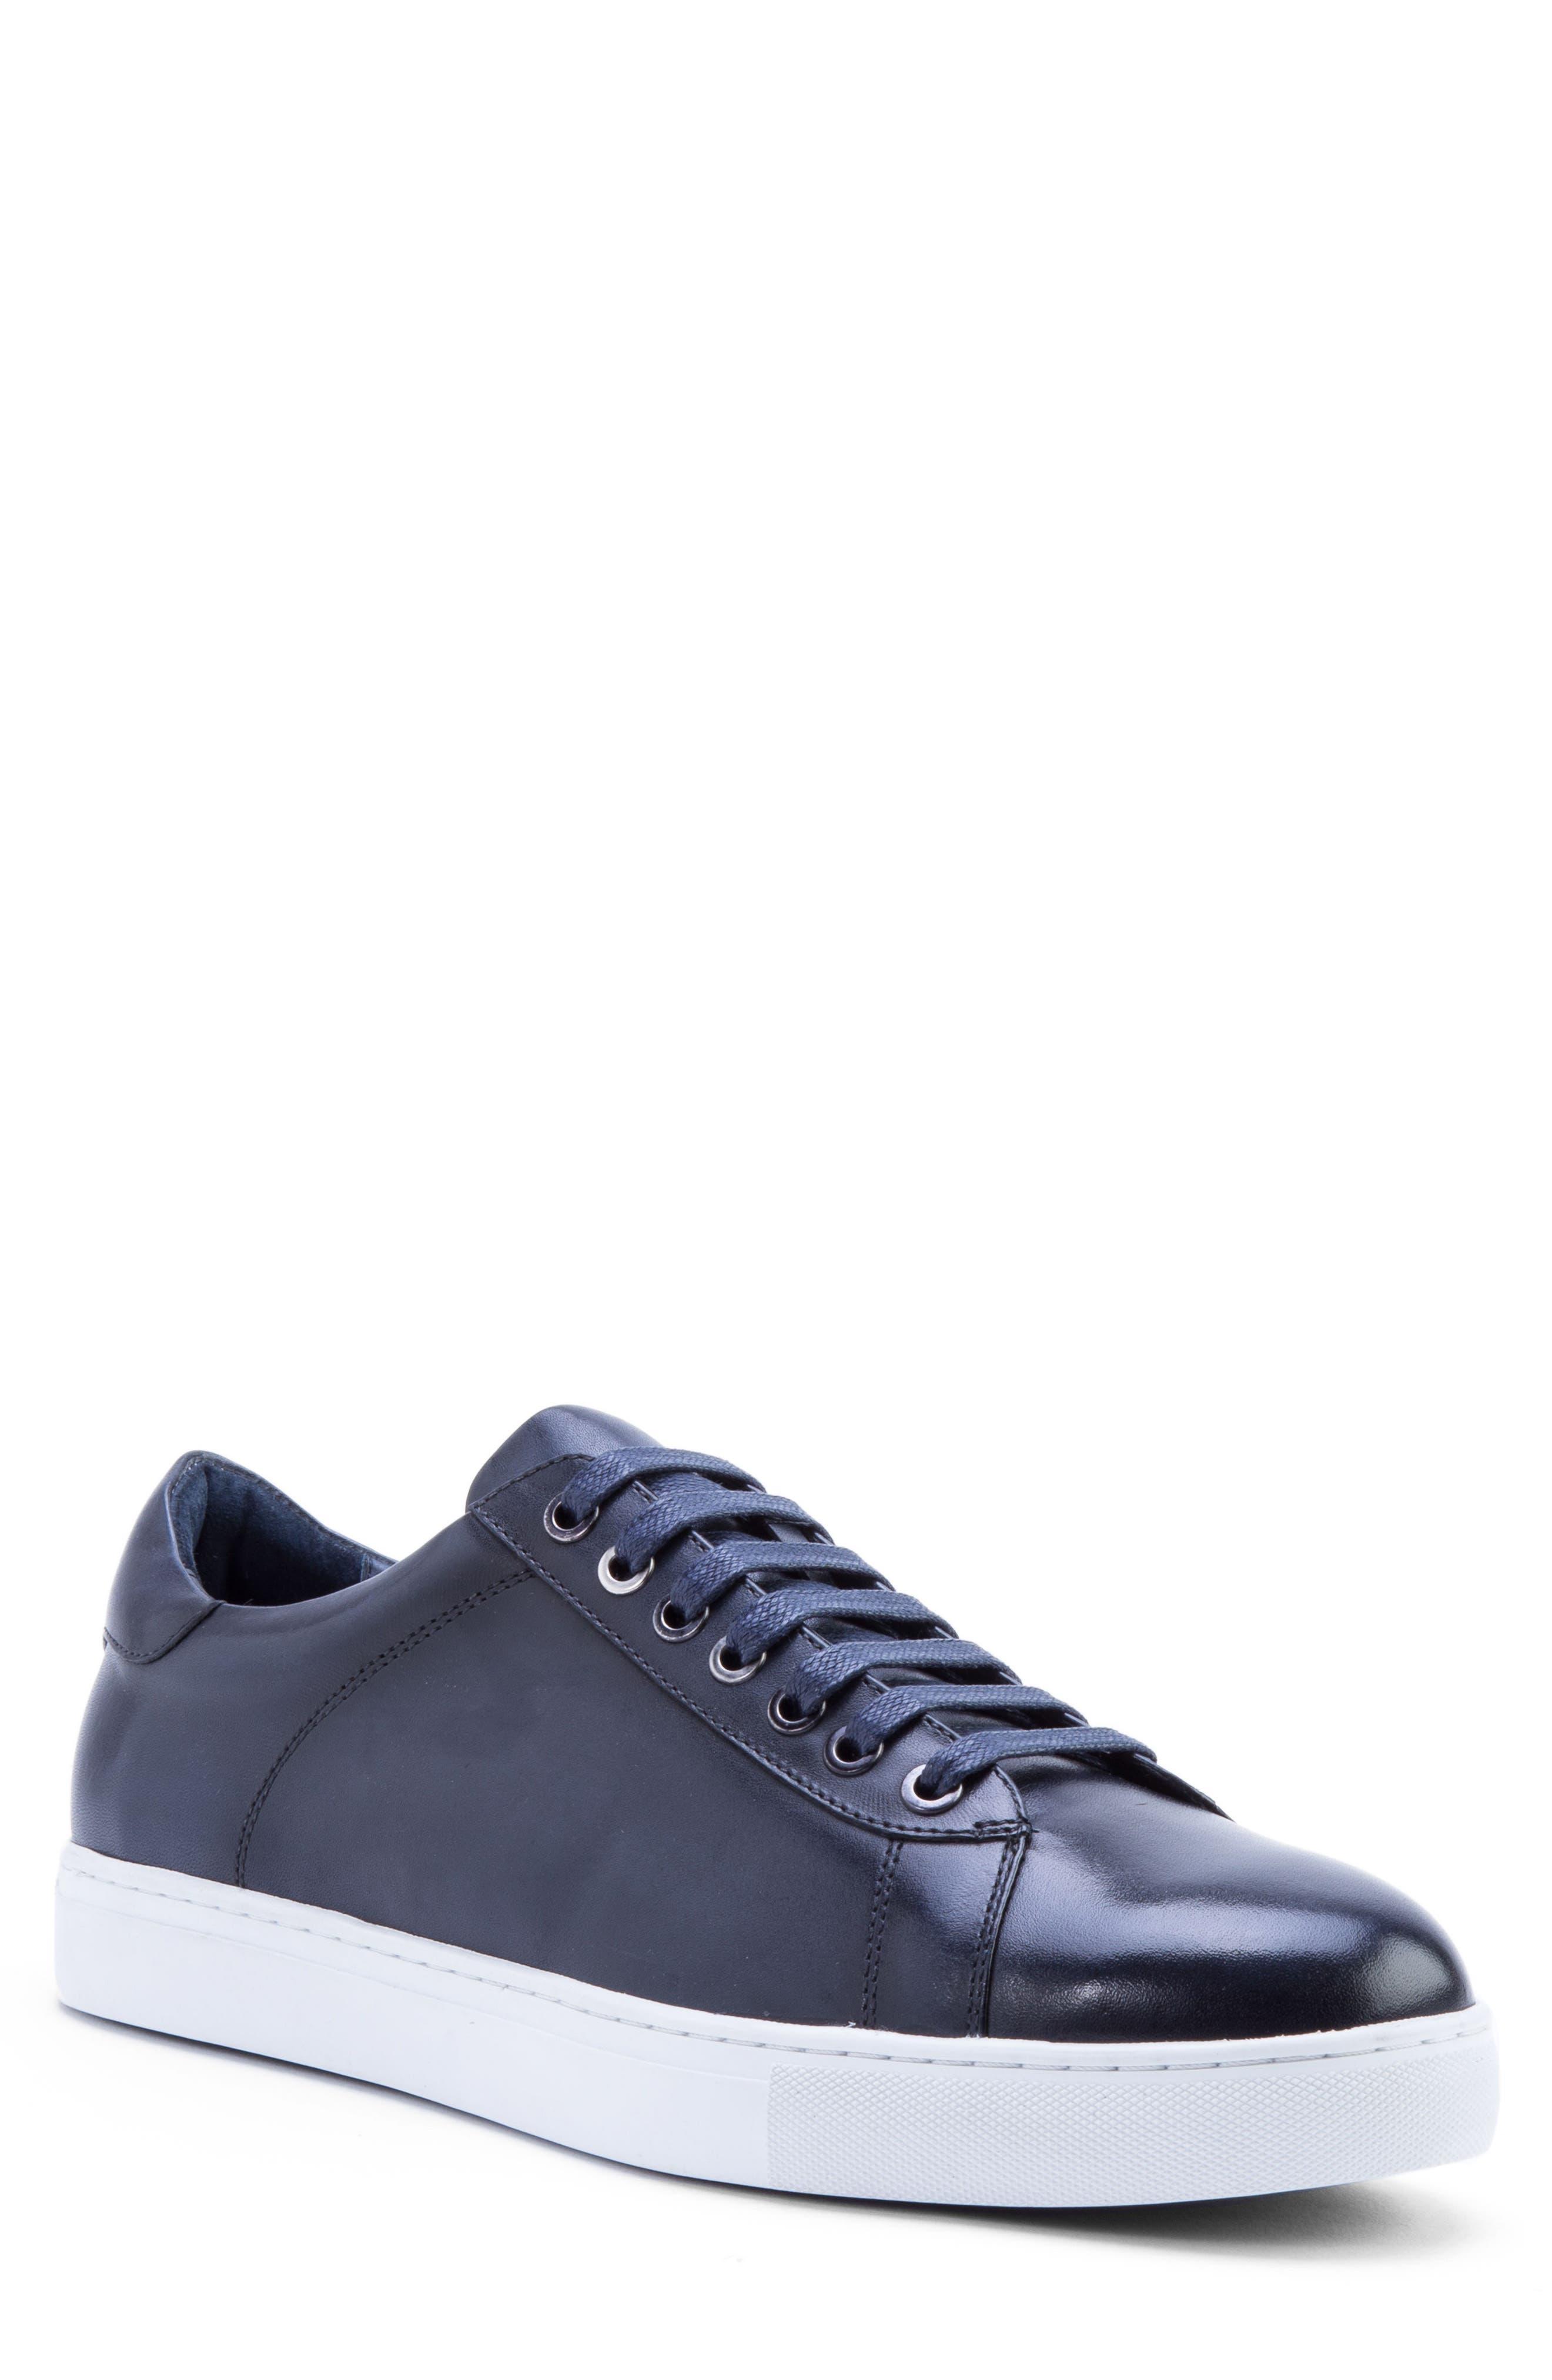 Zanzara Music Low Top Sneaker, Blue